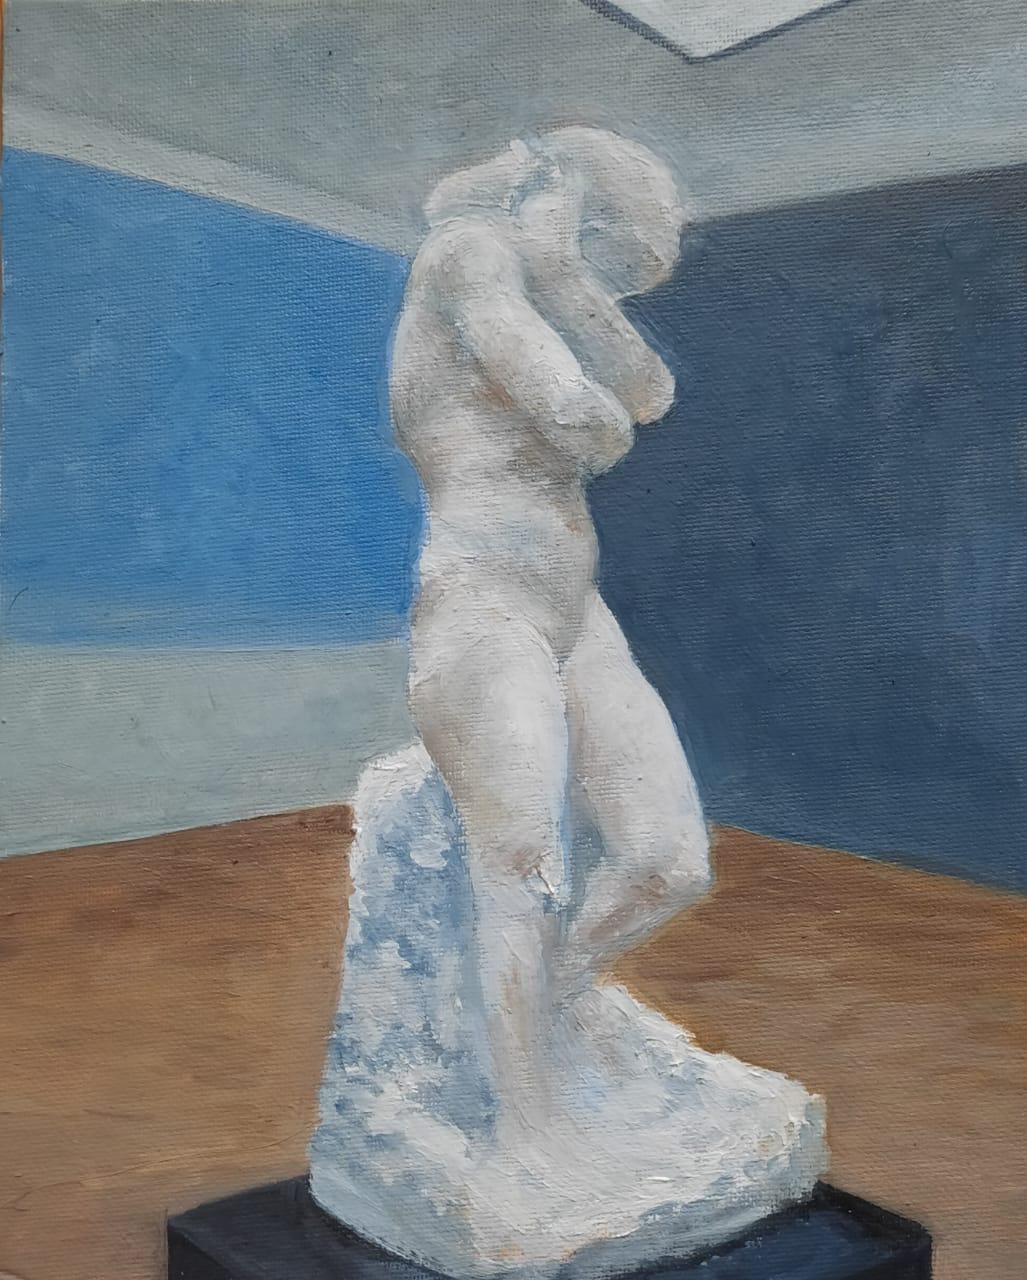 Alexandra Sergeevna Fedulova. Sculpture by Rodin